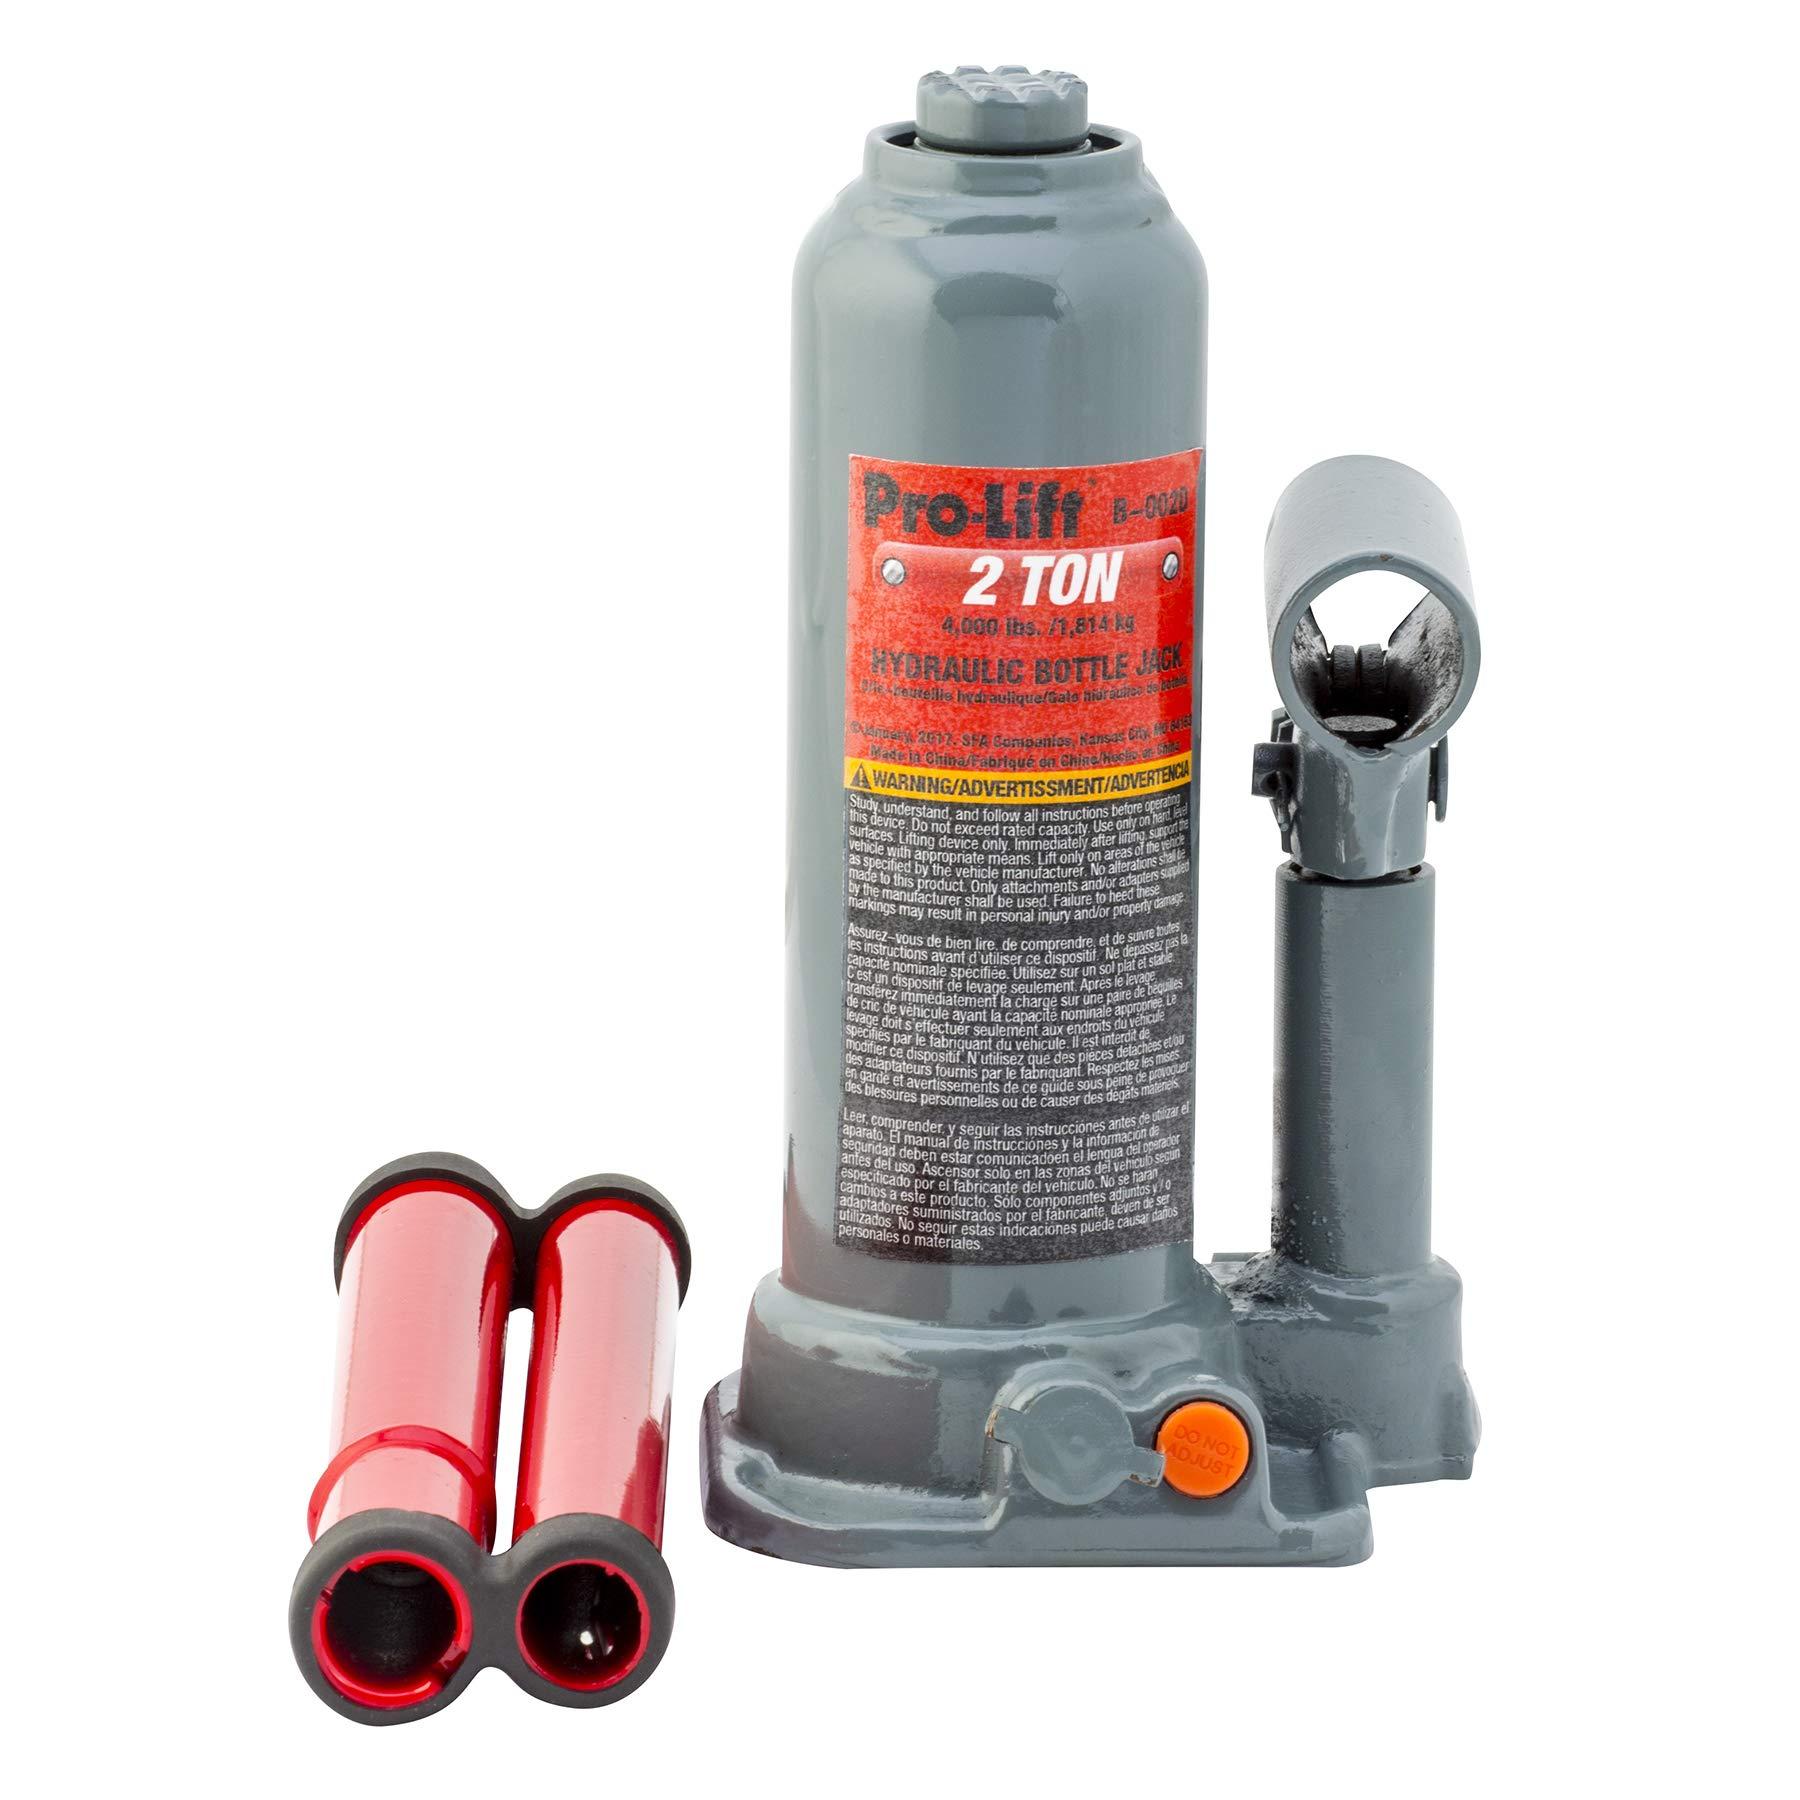 Pro-Lift B-002D Grey Hydraulic Bottle Jack - 2 Ton Capacity by Pro-LifT